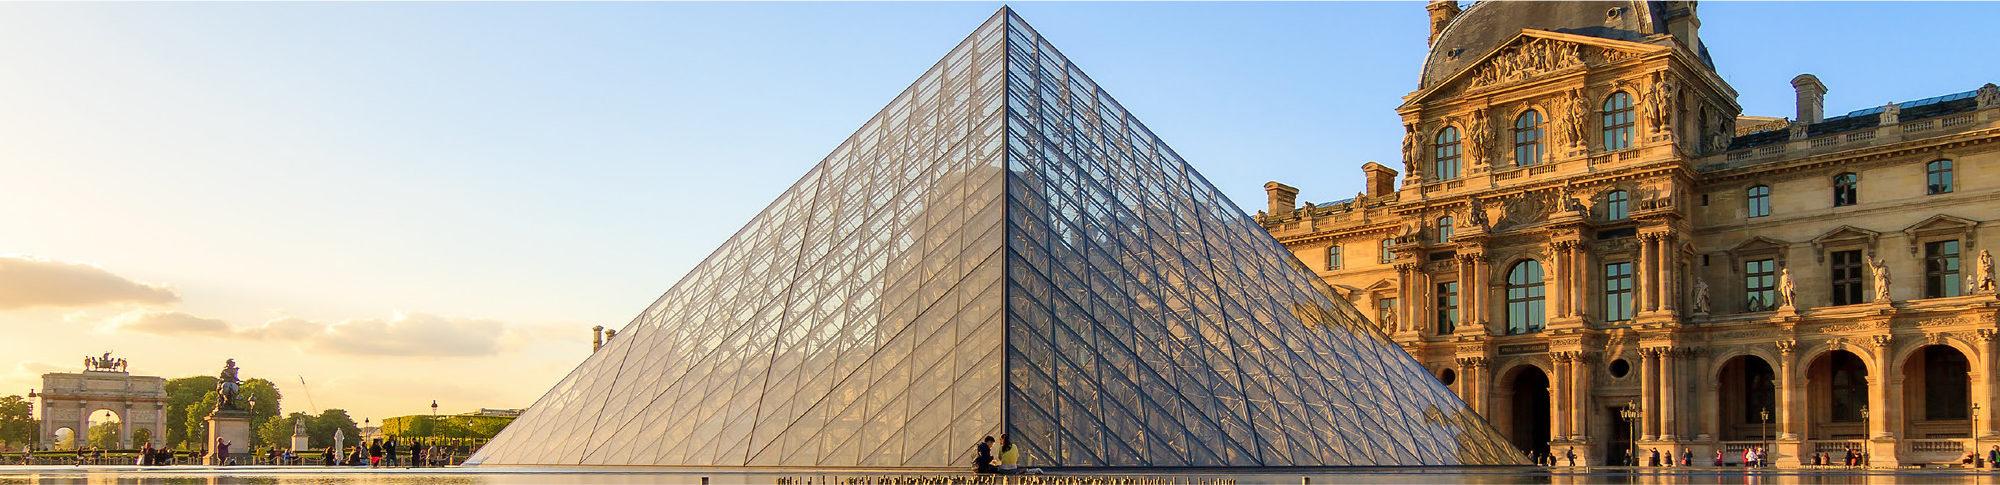 Pyramide du Louvre - LFFO